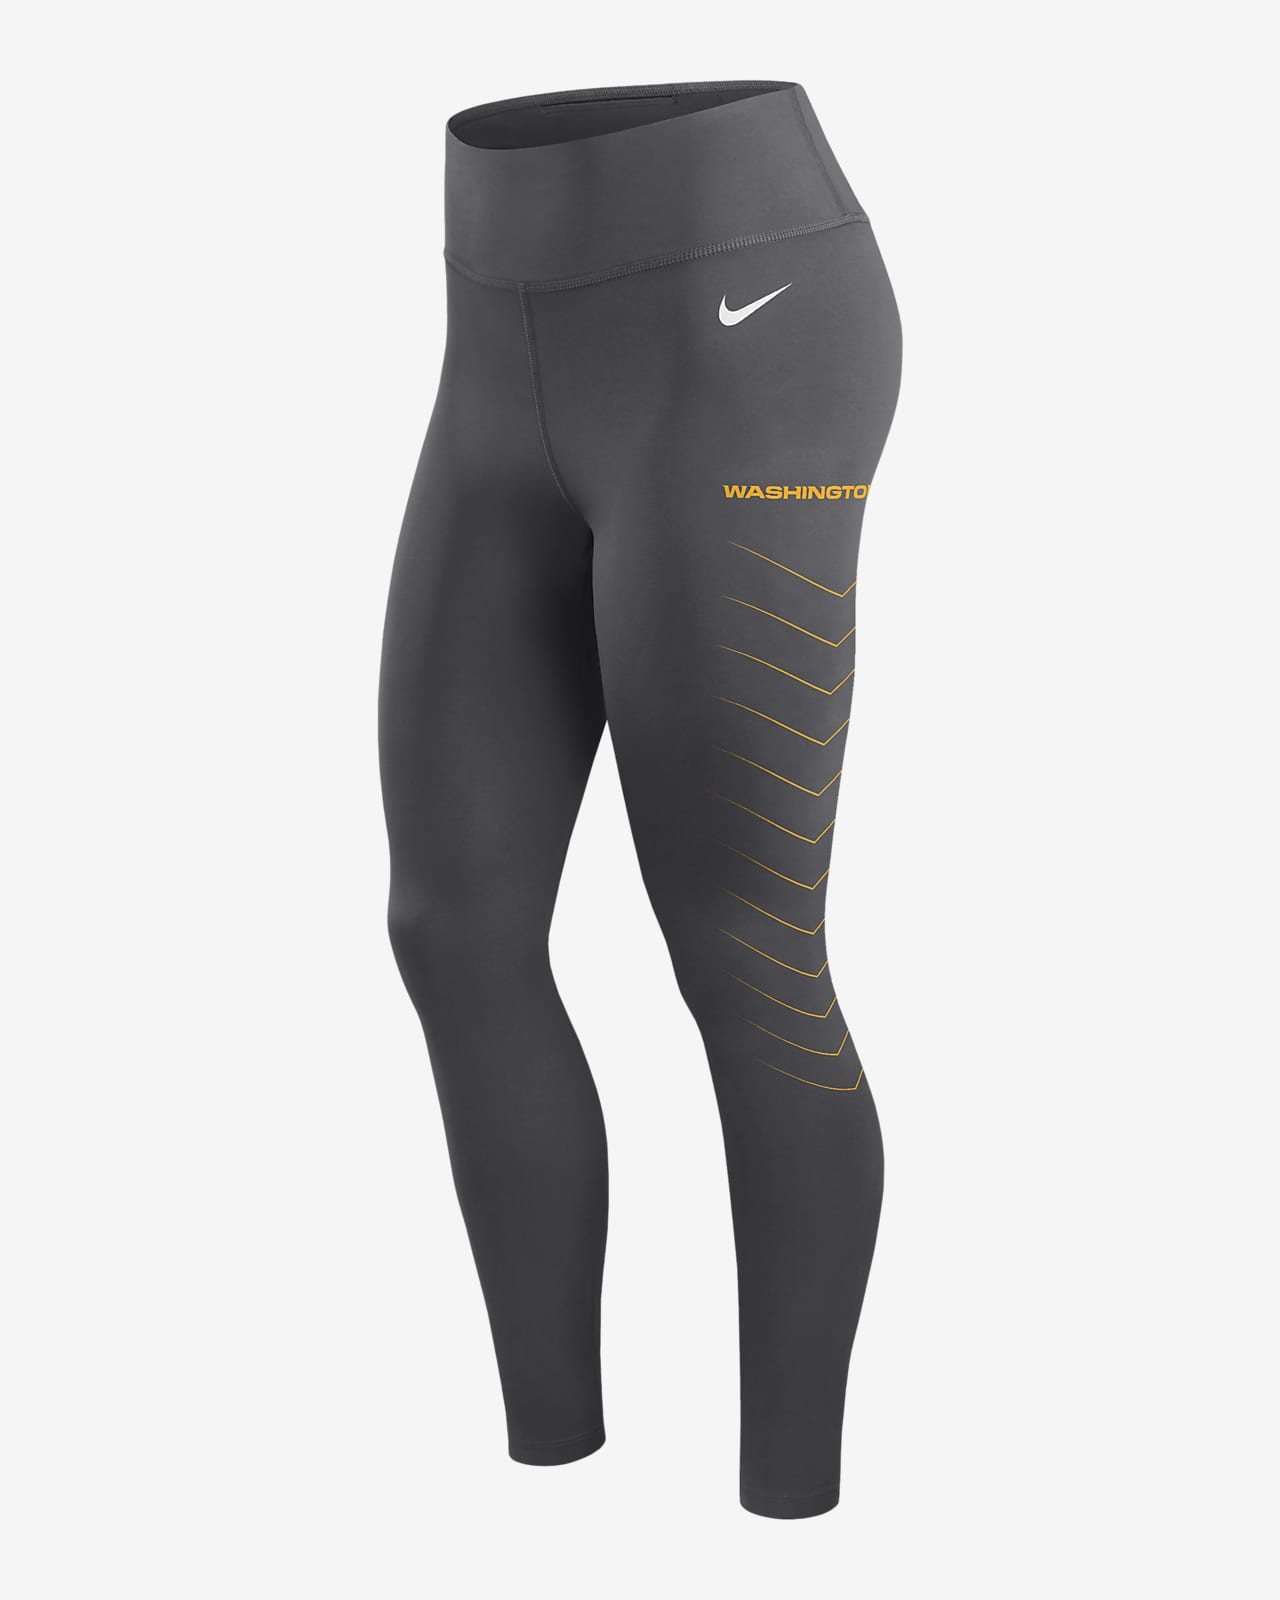 Nike Dri-FIT (NFL Washington Football Team) Women's Leggings